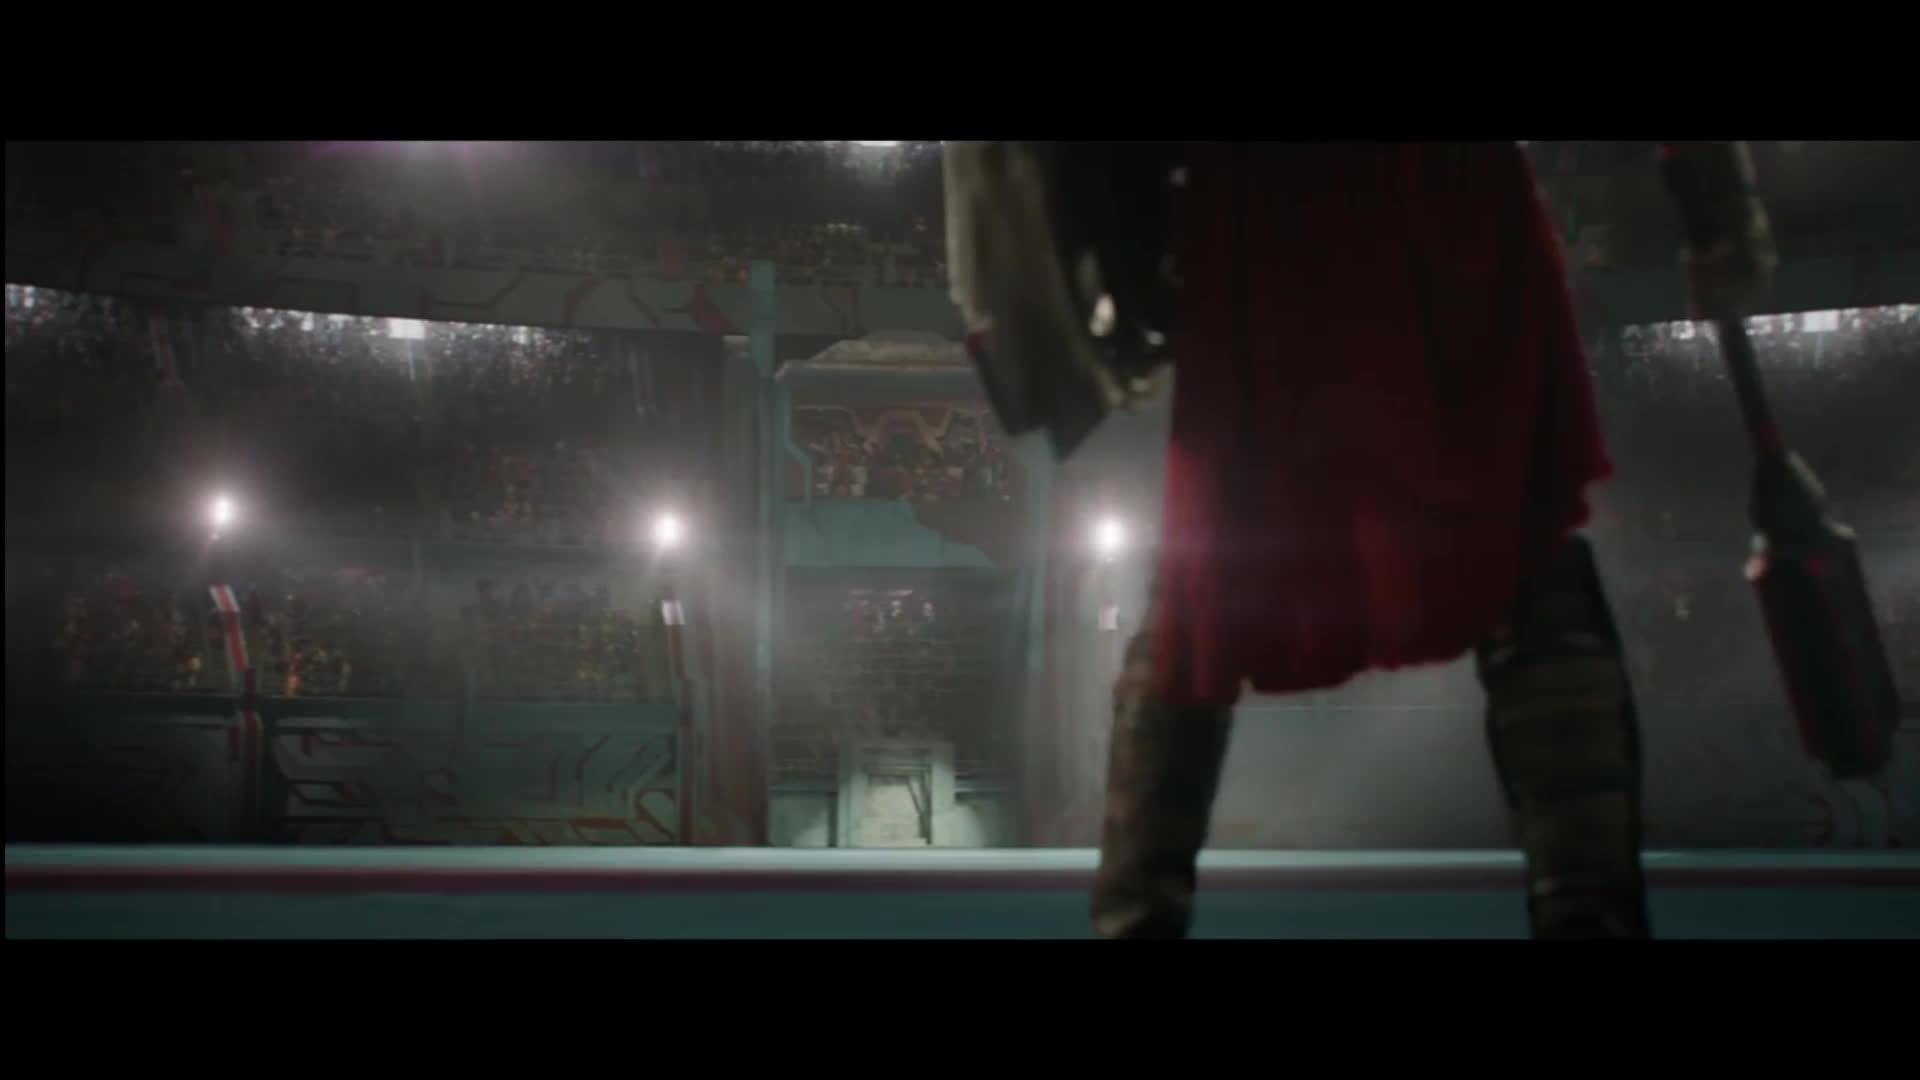 marvelstudios, The Official Thor: Ragnarok Teaser Hype Thread (reddit) GIFs